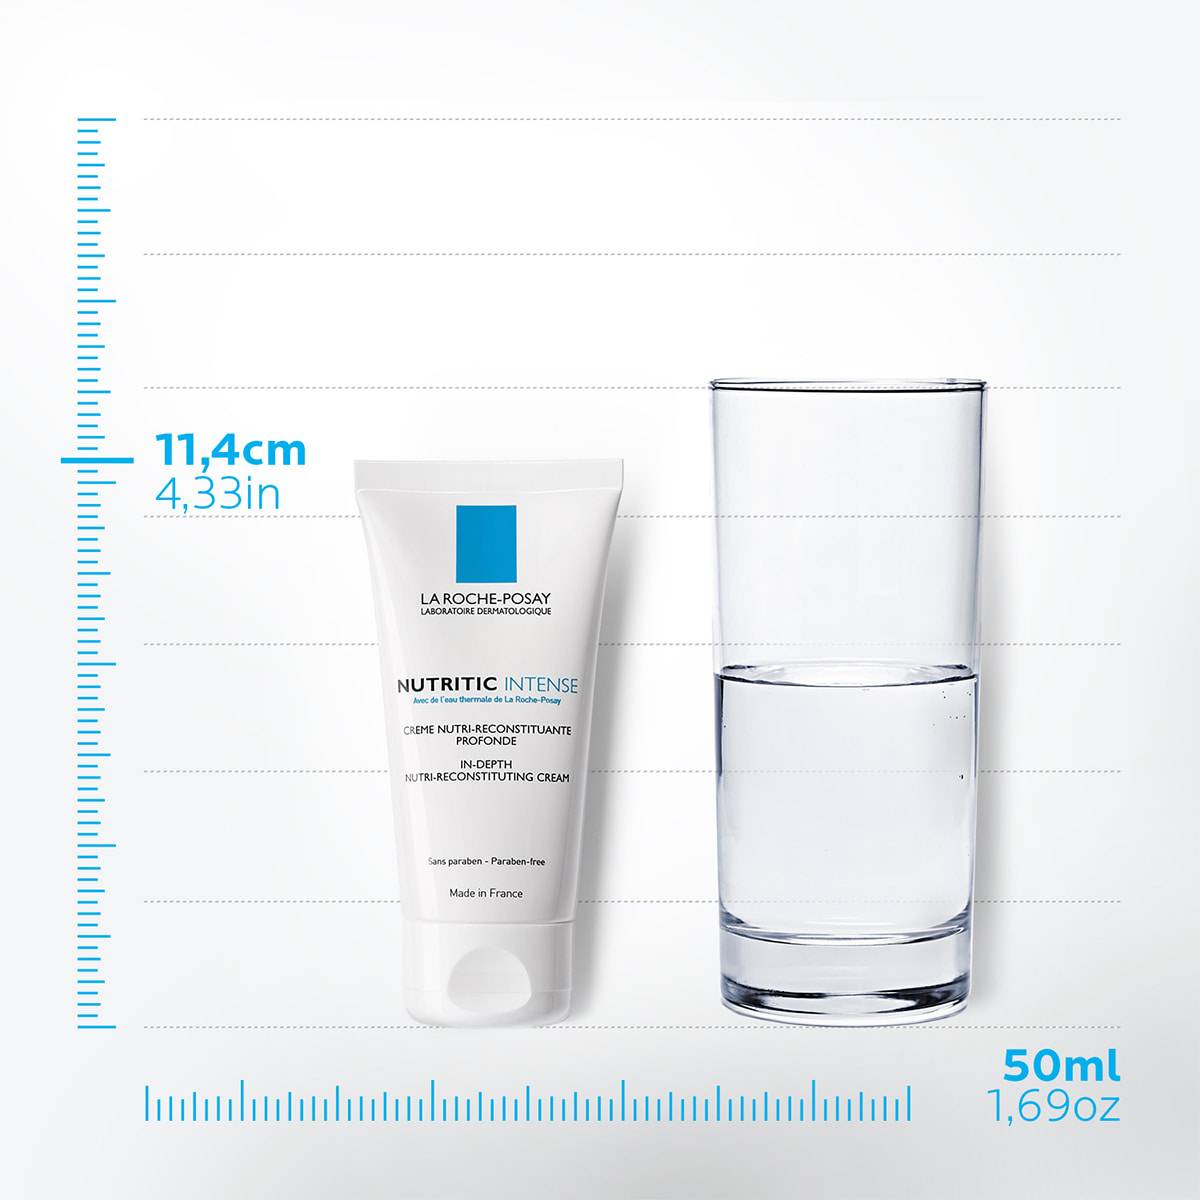 La Roche Posay ProduktSide Ansiktspleie Nutritic Intense Cream 50ml 33378